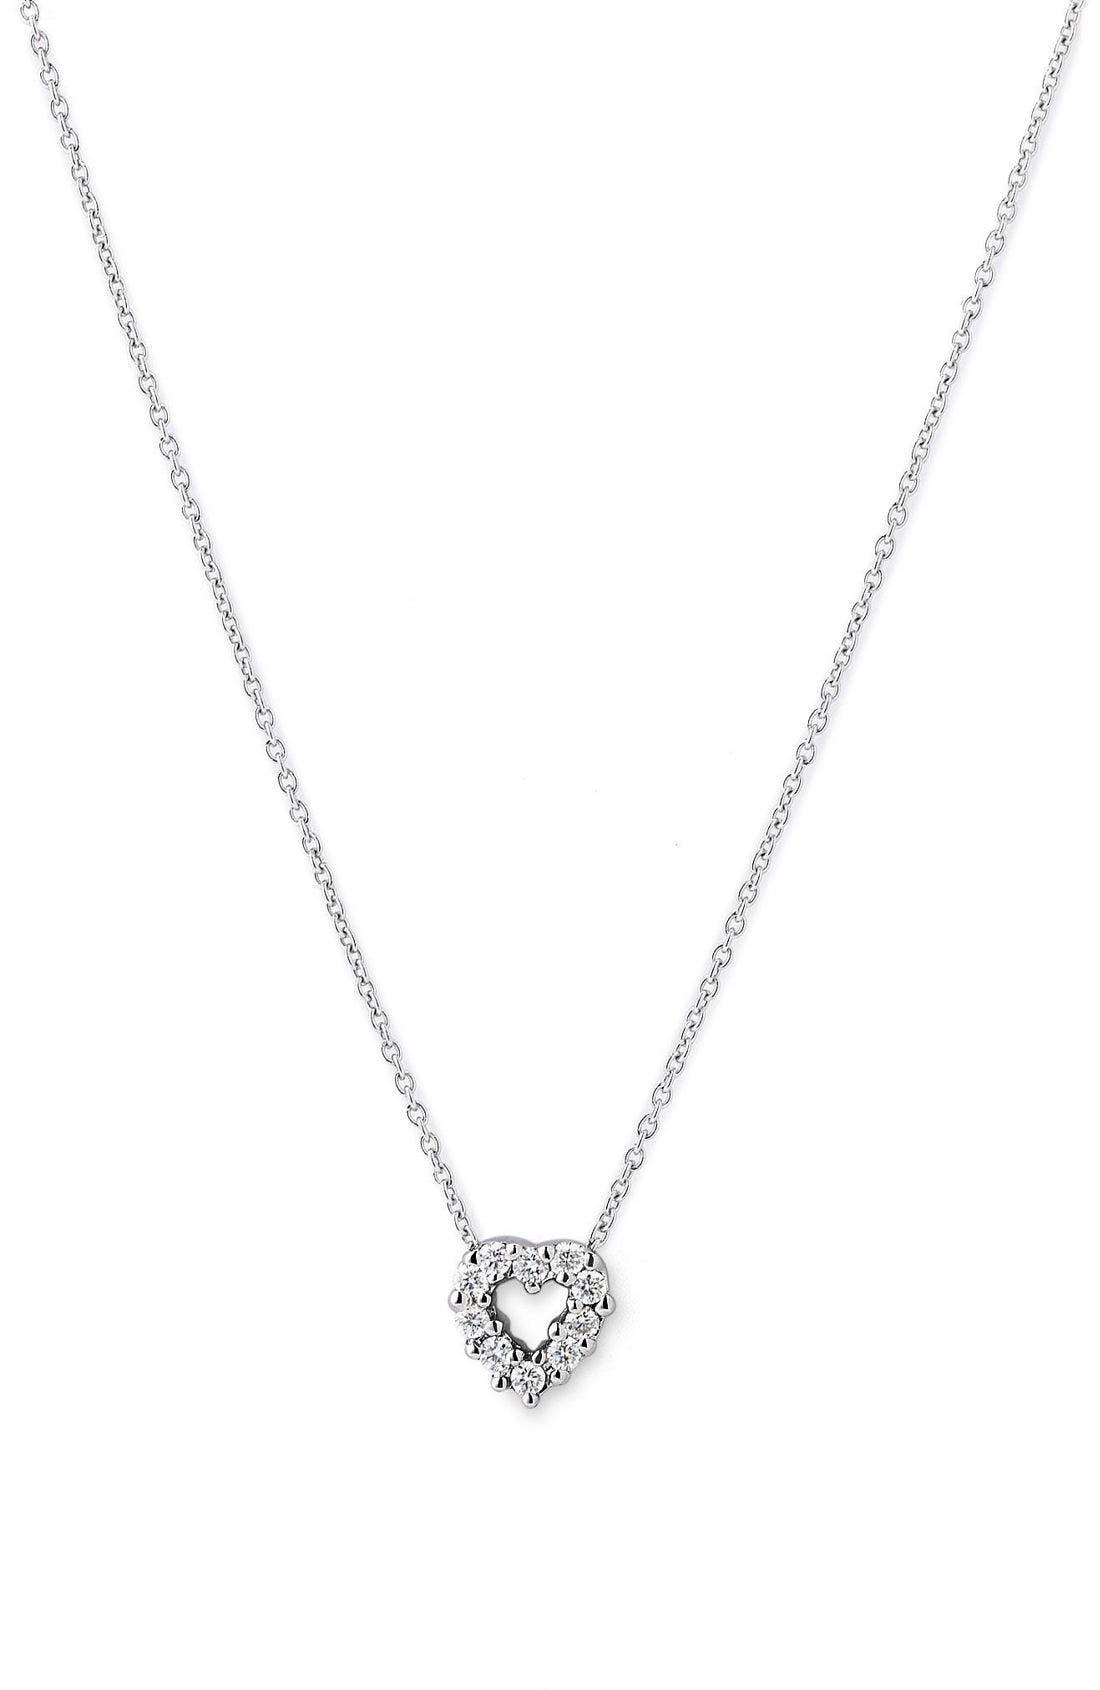 'Tiny Treasures' Diamond Heart Pendant Necklace,                             Main thumbnail 1, color,                             WHITE GOLD